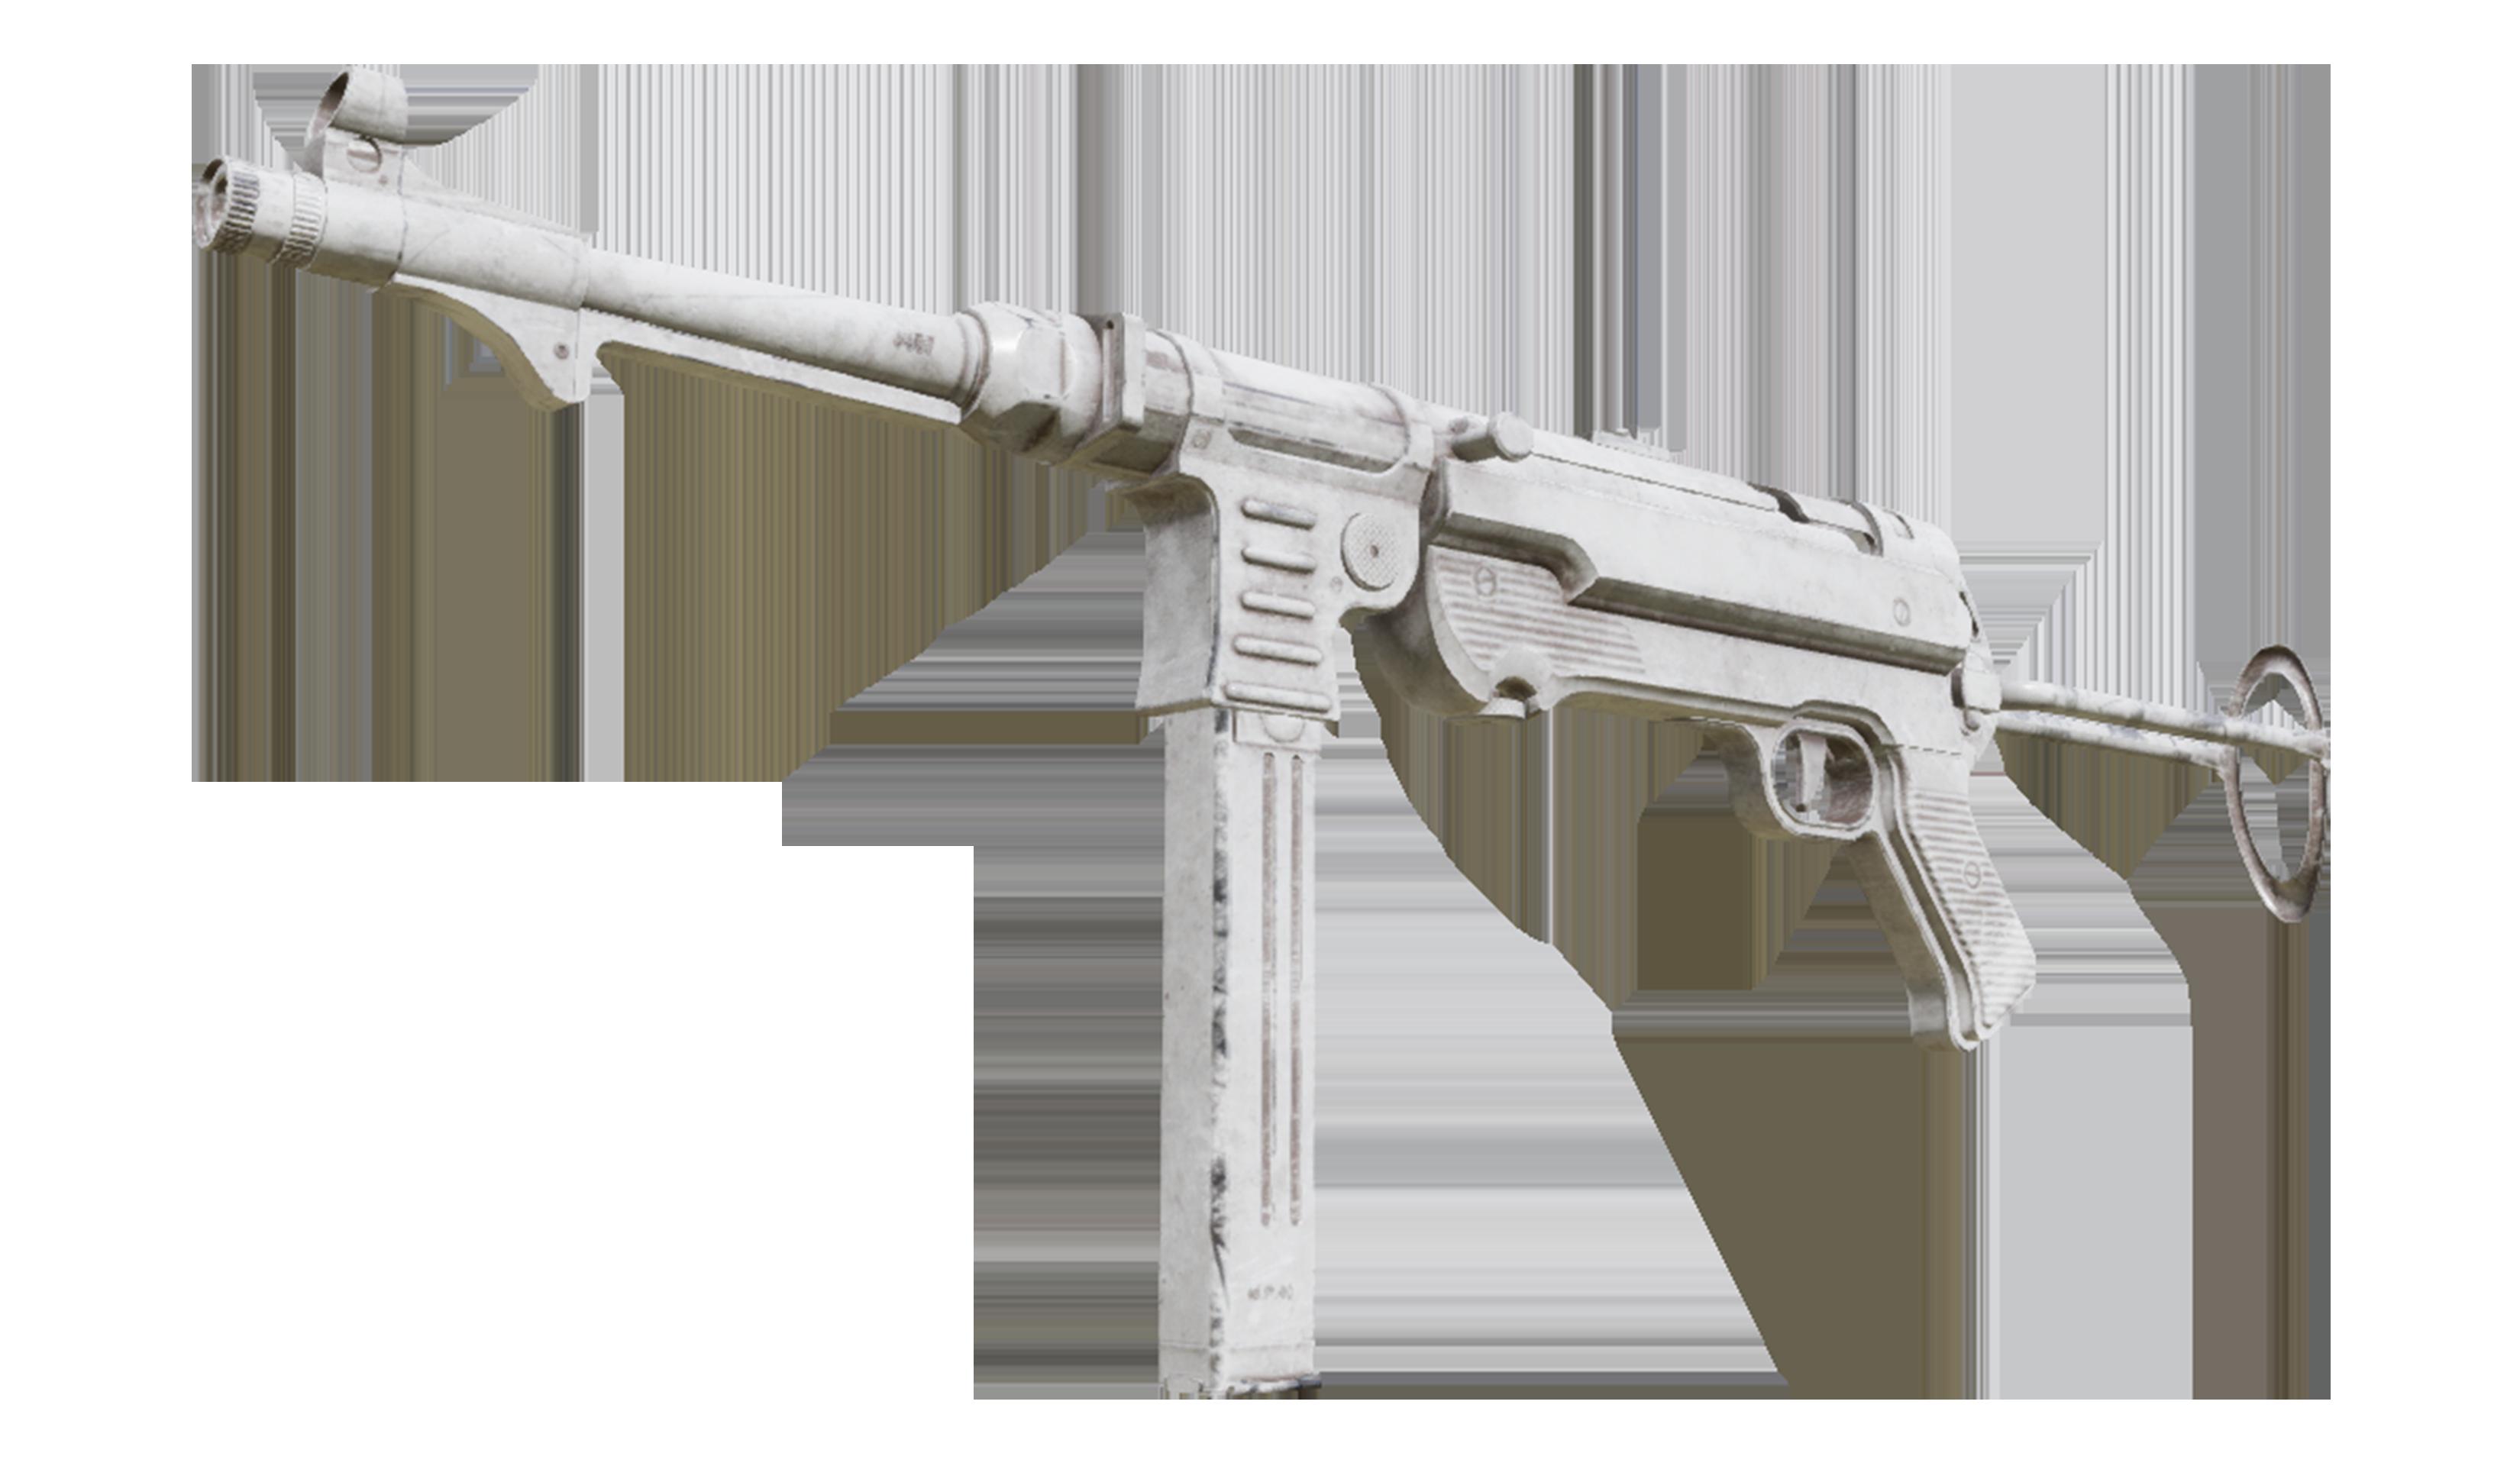 MP40 | Snow Camo